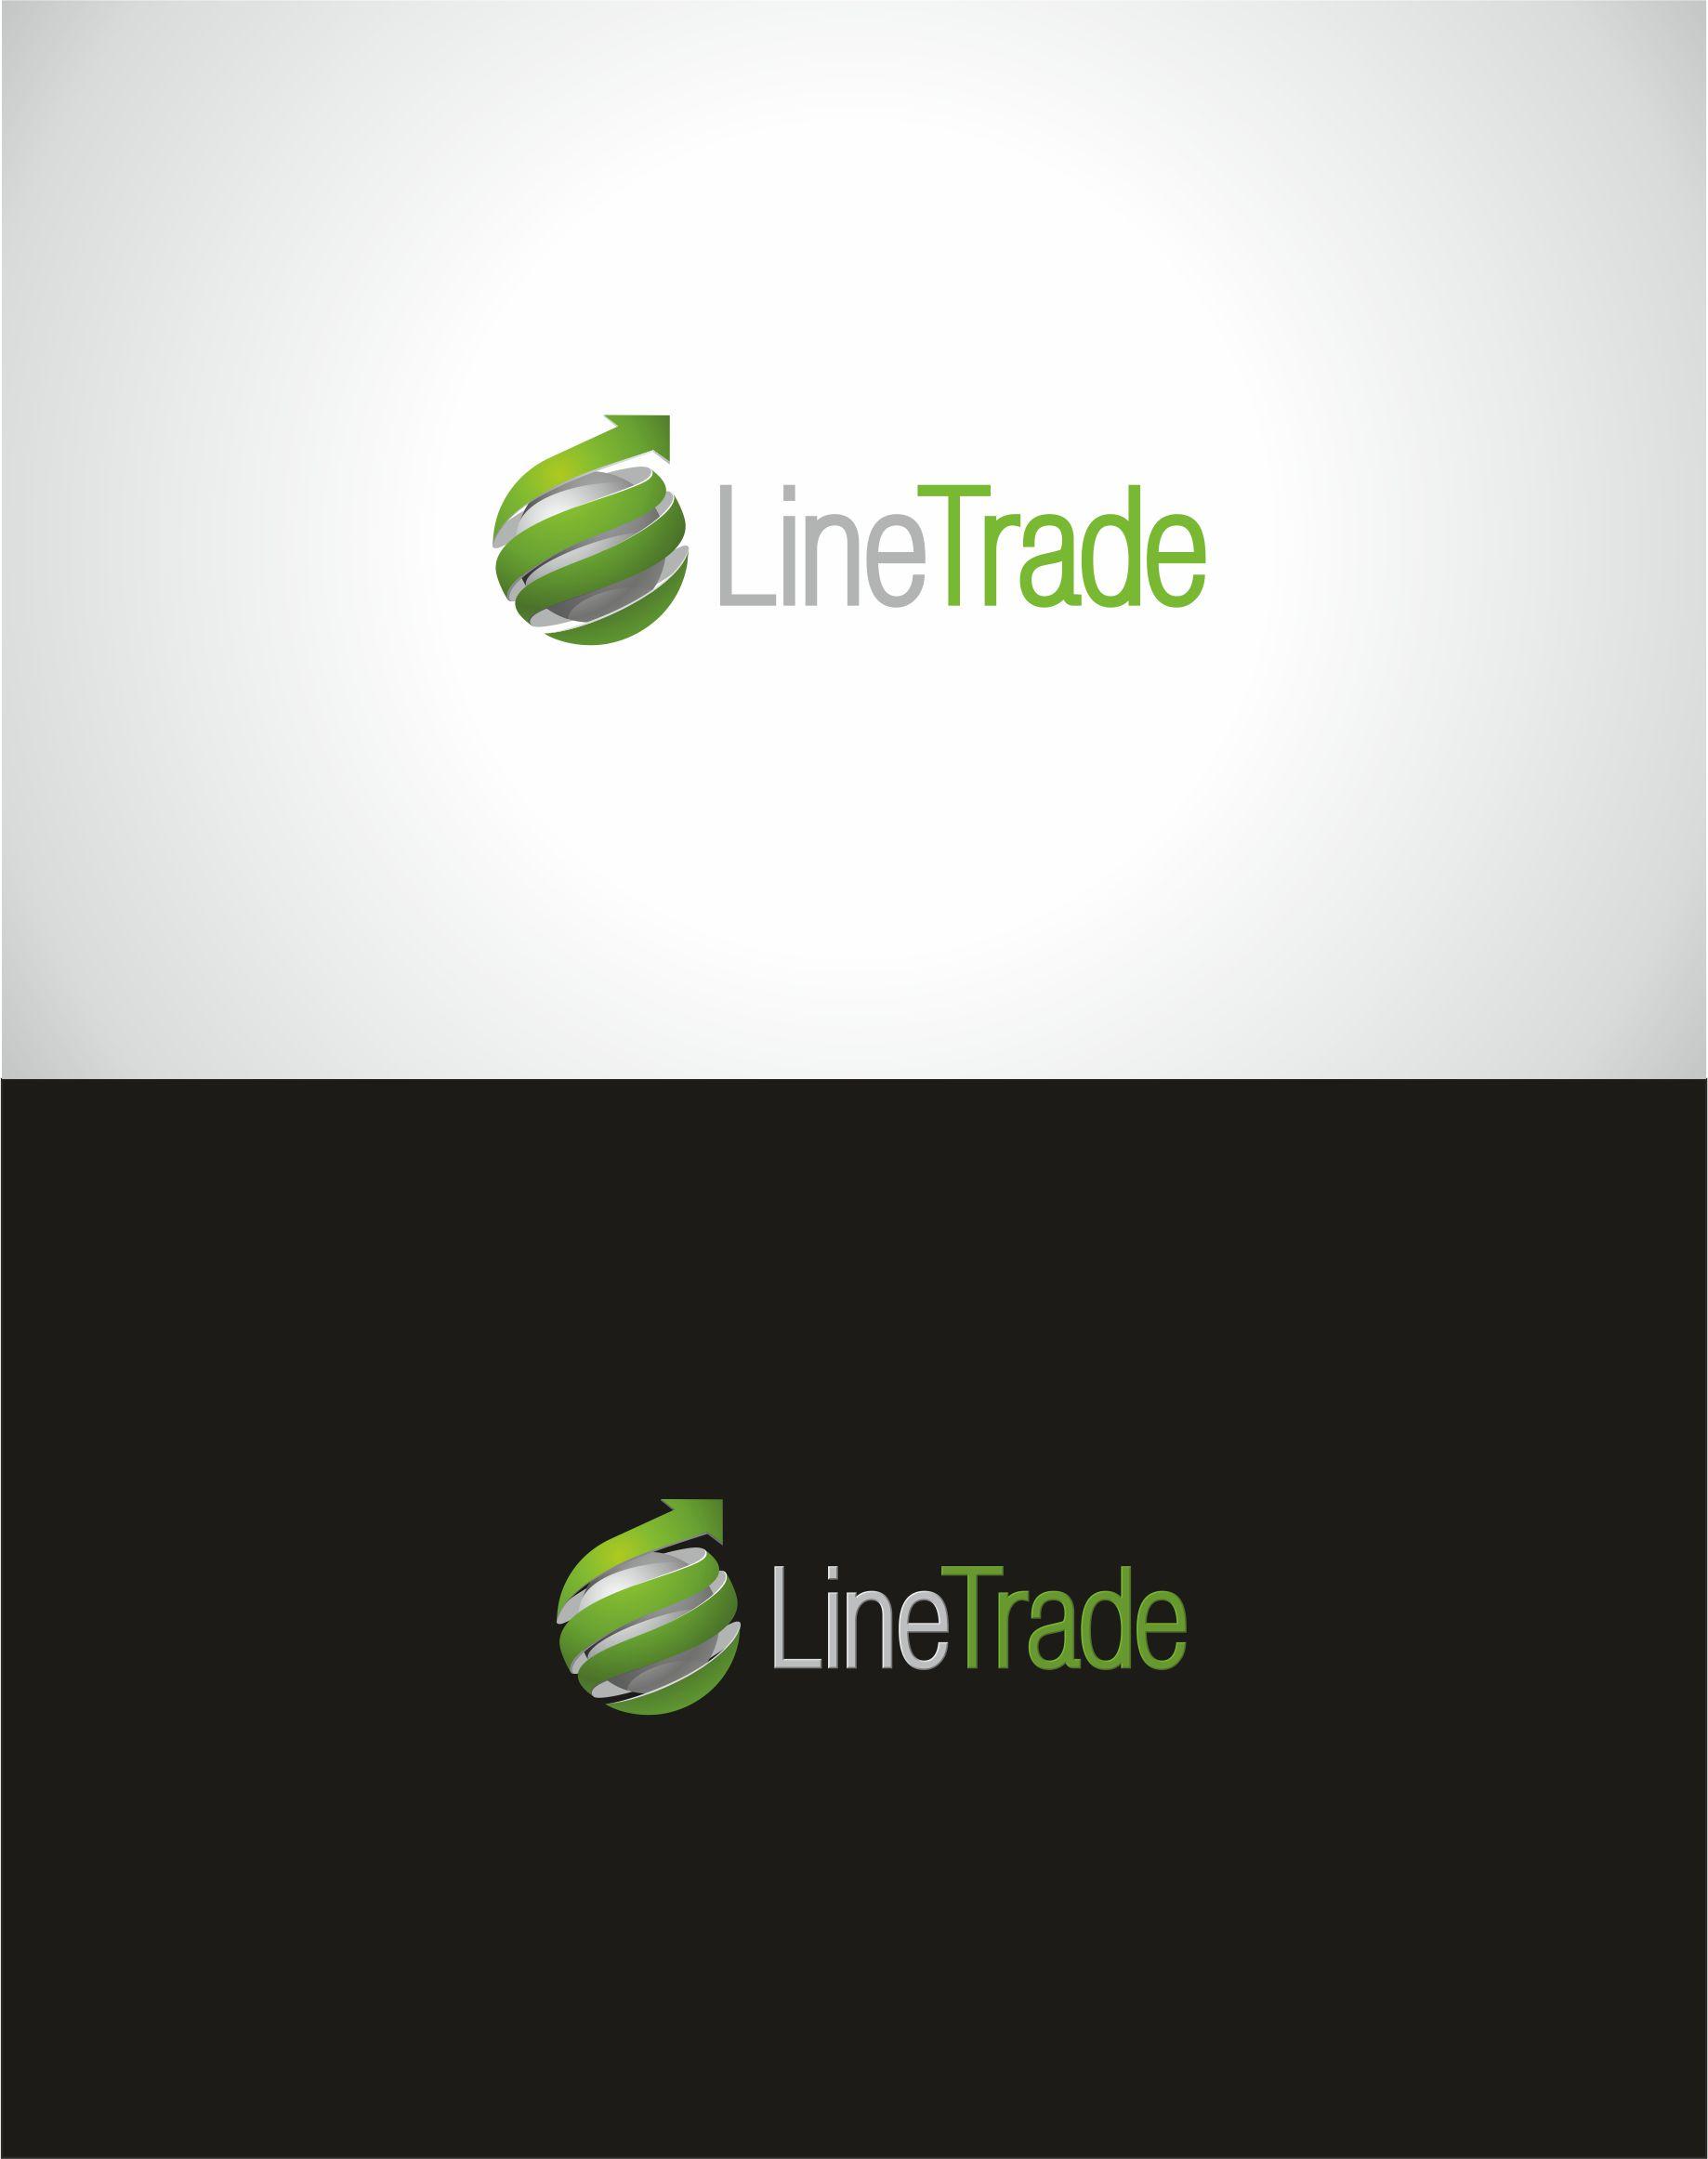 Разработка логотипа компании Line Trade фото f_57350f7b419165de.jpg